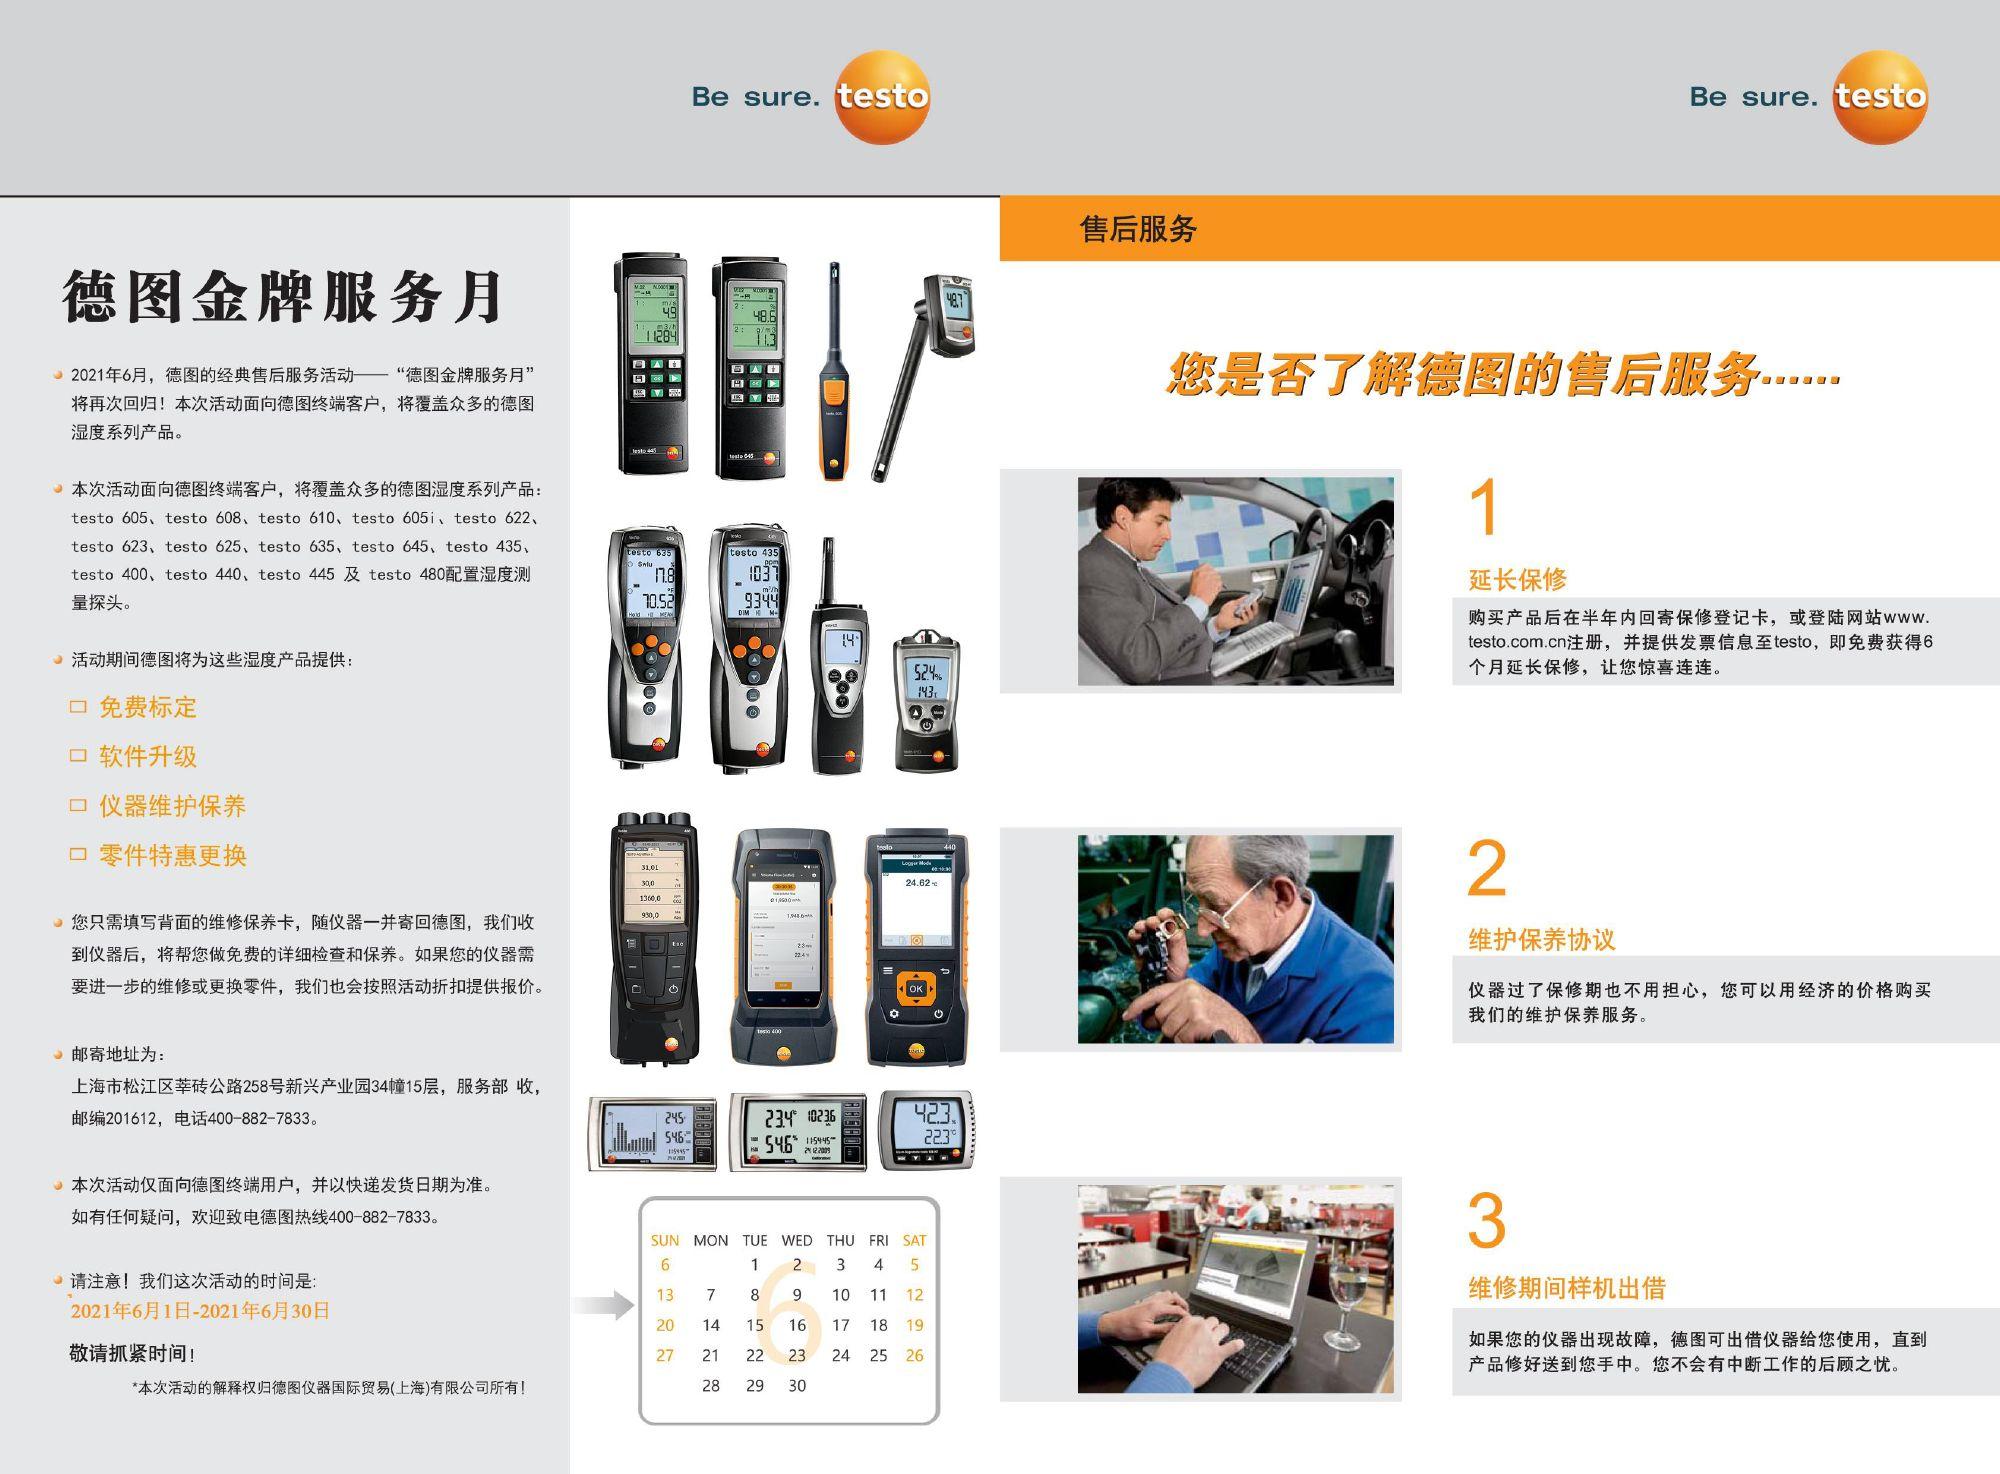 CN_20210531_hvacr_service_humidity-card-imageV2.jpg